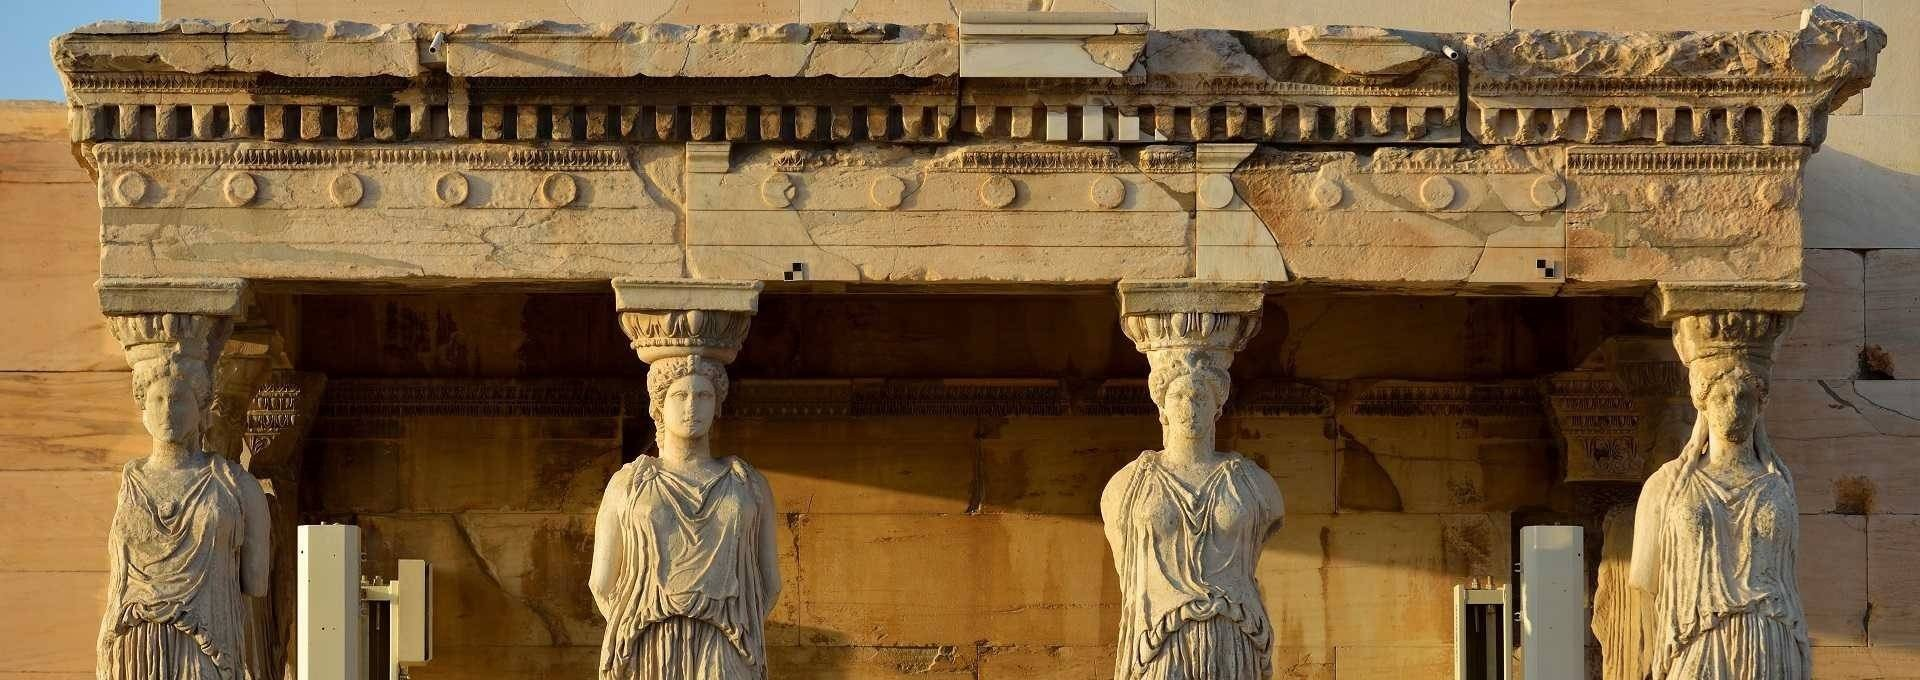 Skip the Line: Athens City Tour, Breathtaking Acropolis & Acropolis Museum